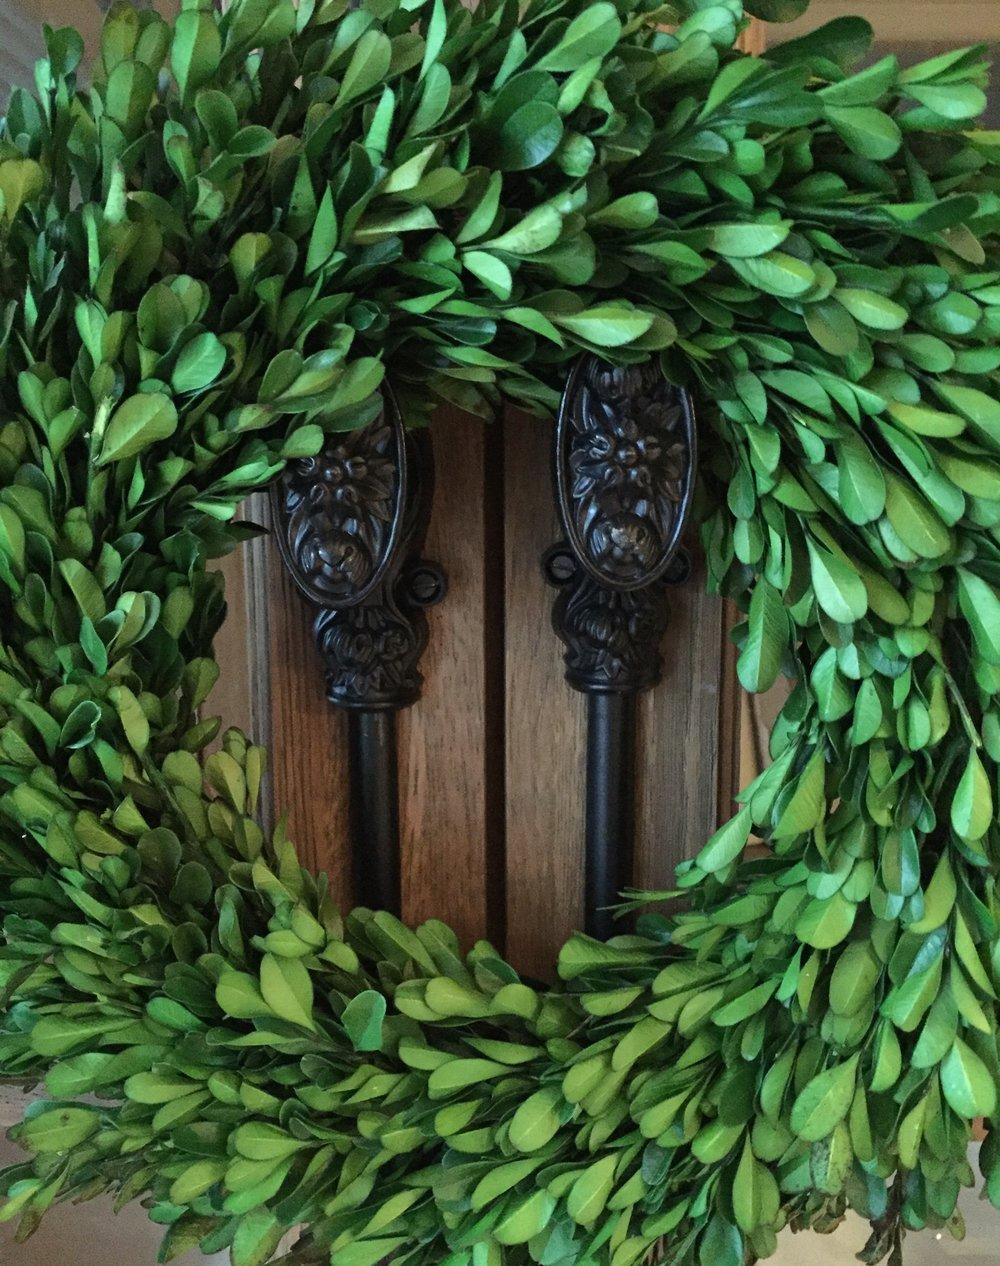 evergreen-wreath-on-double-doors.jpg